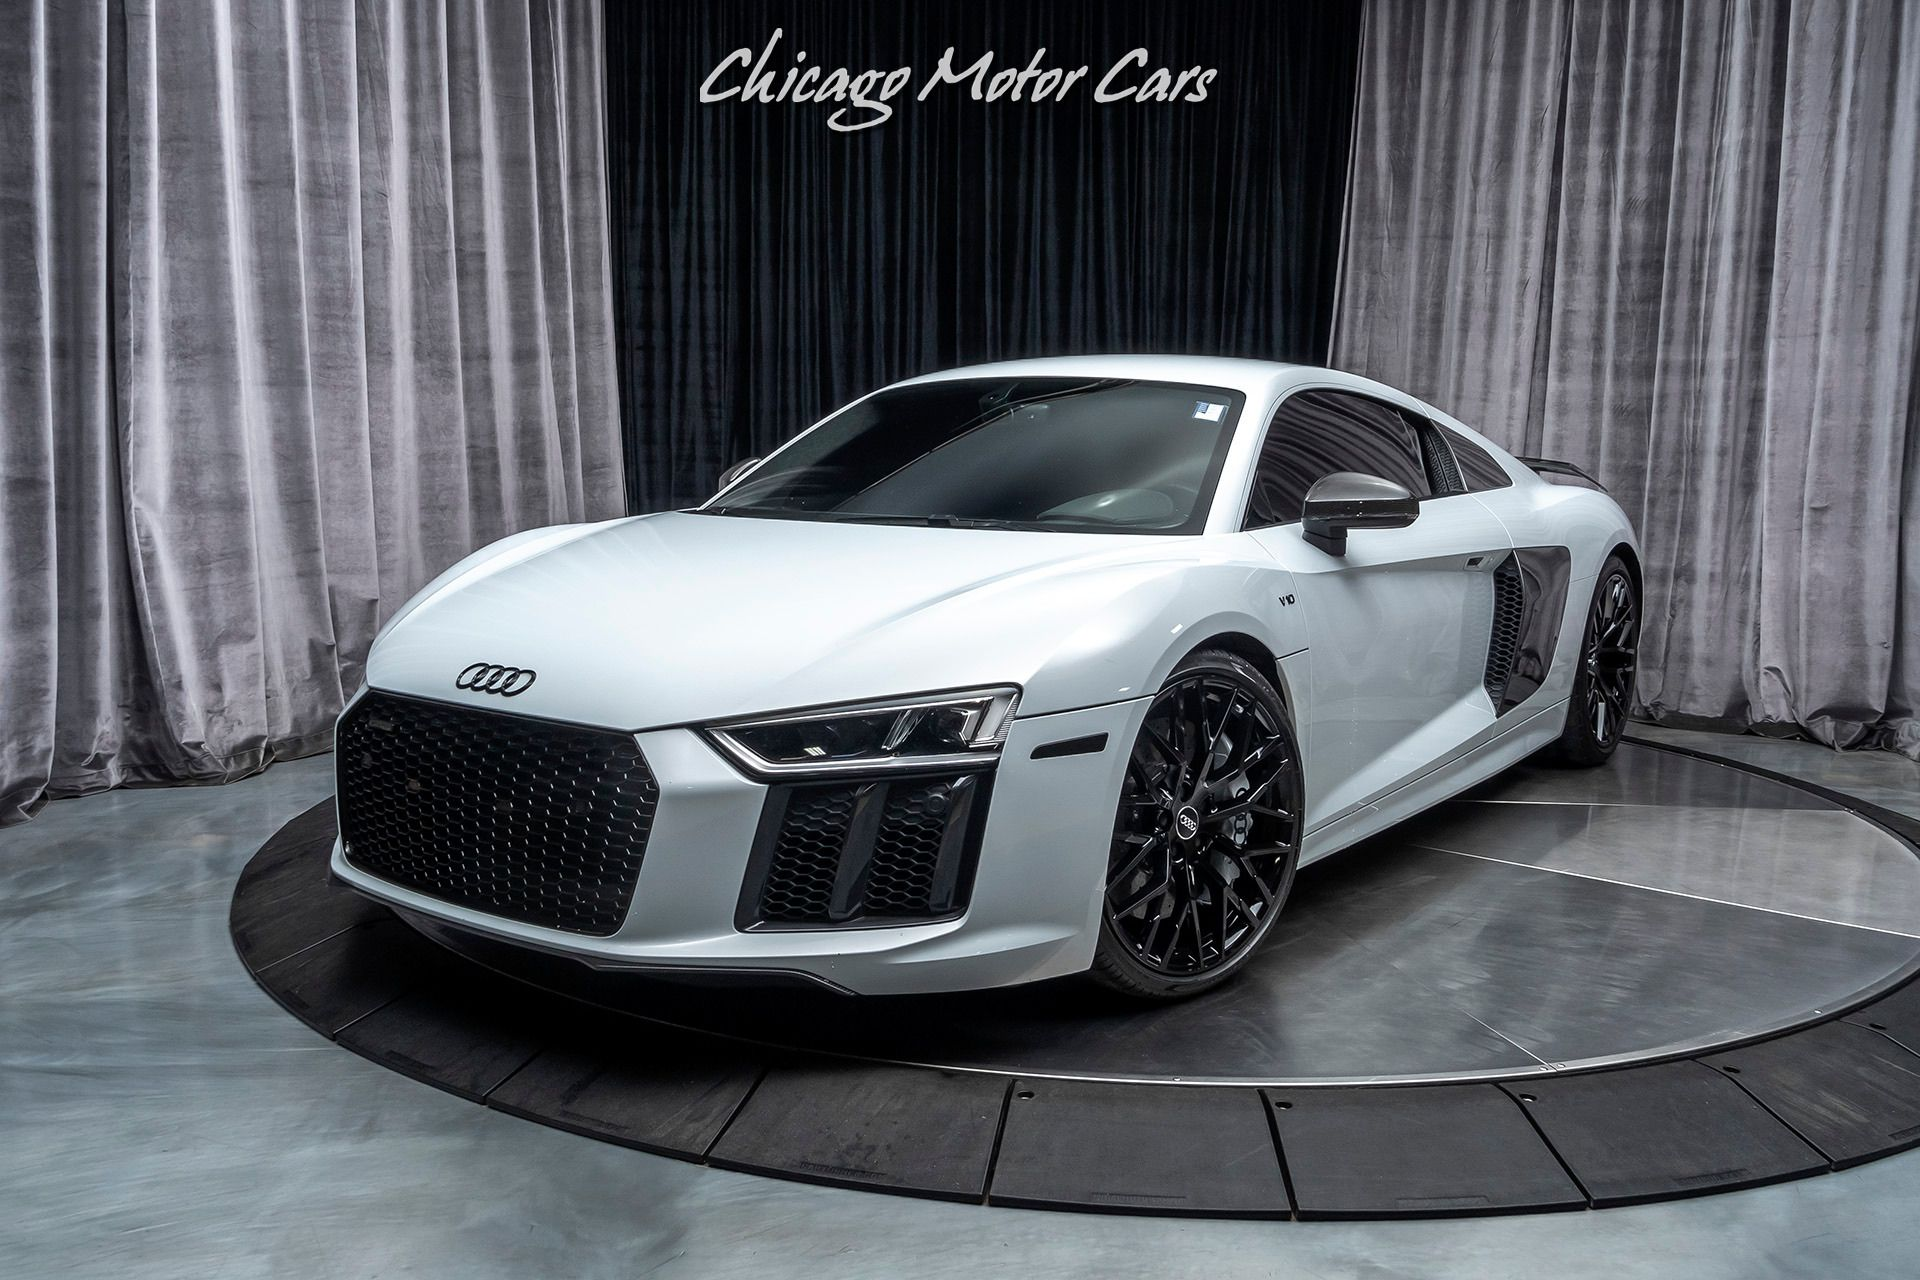 2017 Audi R8 5 2 Quattro V10 Plus Msrp Chicago Motor Cars United States For Sale On Luxurypulse Audi Motor Car Audi R8